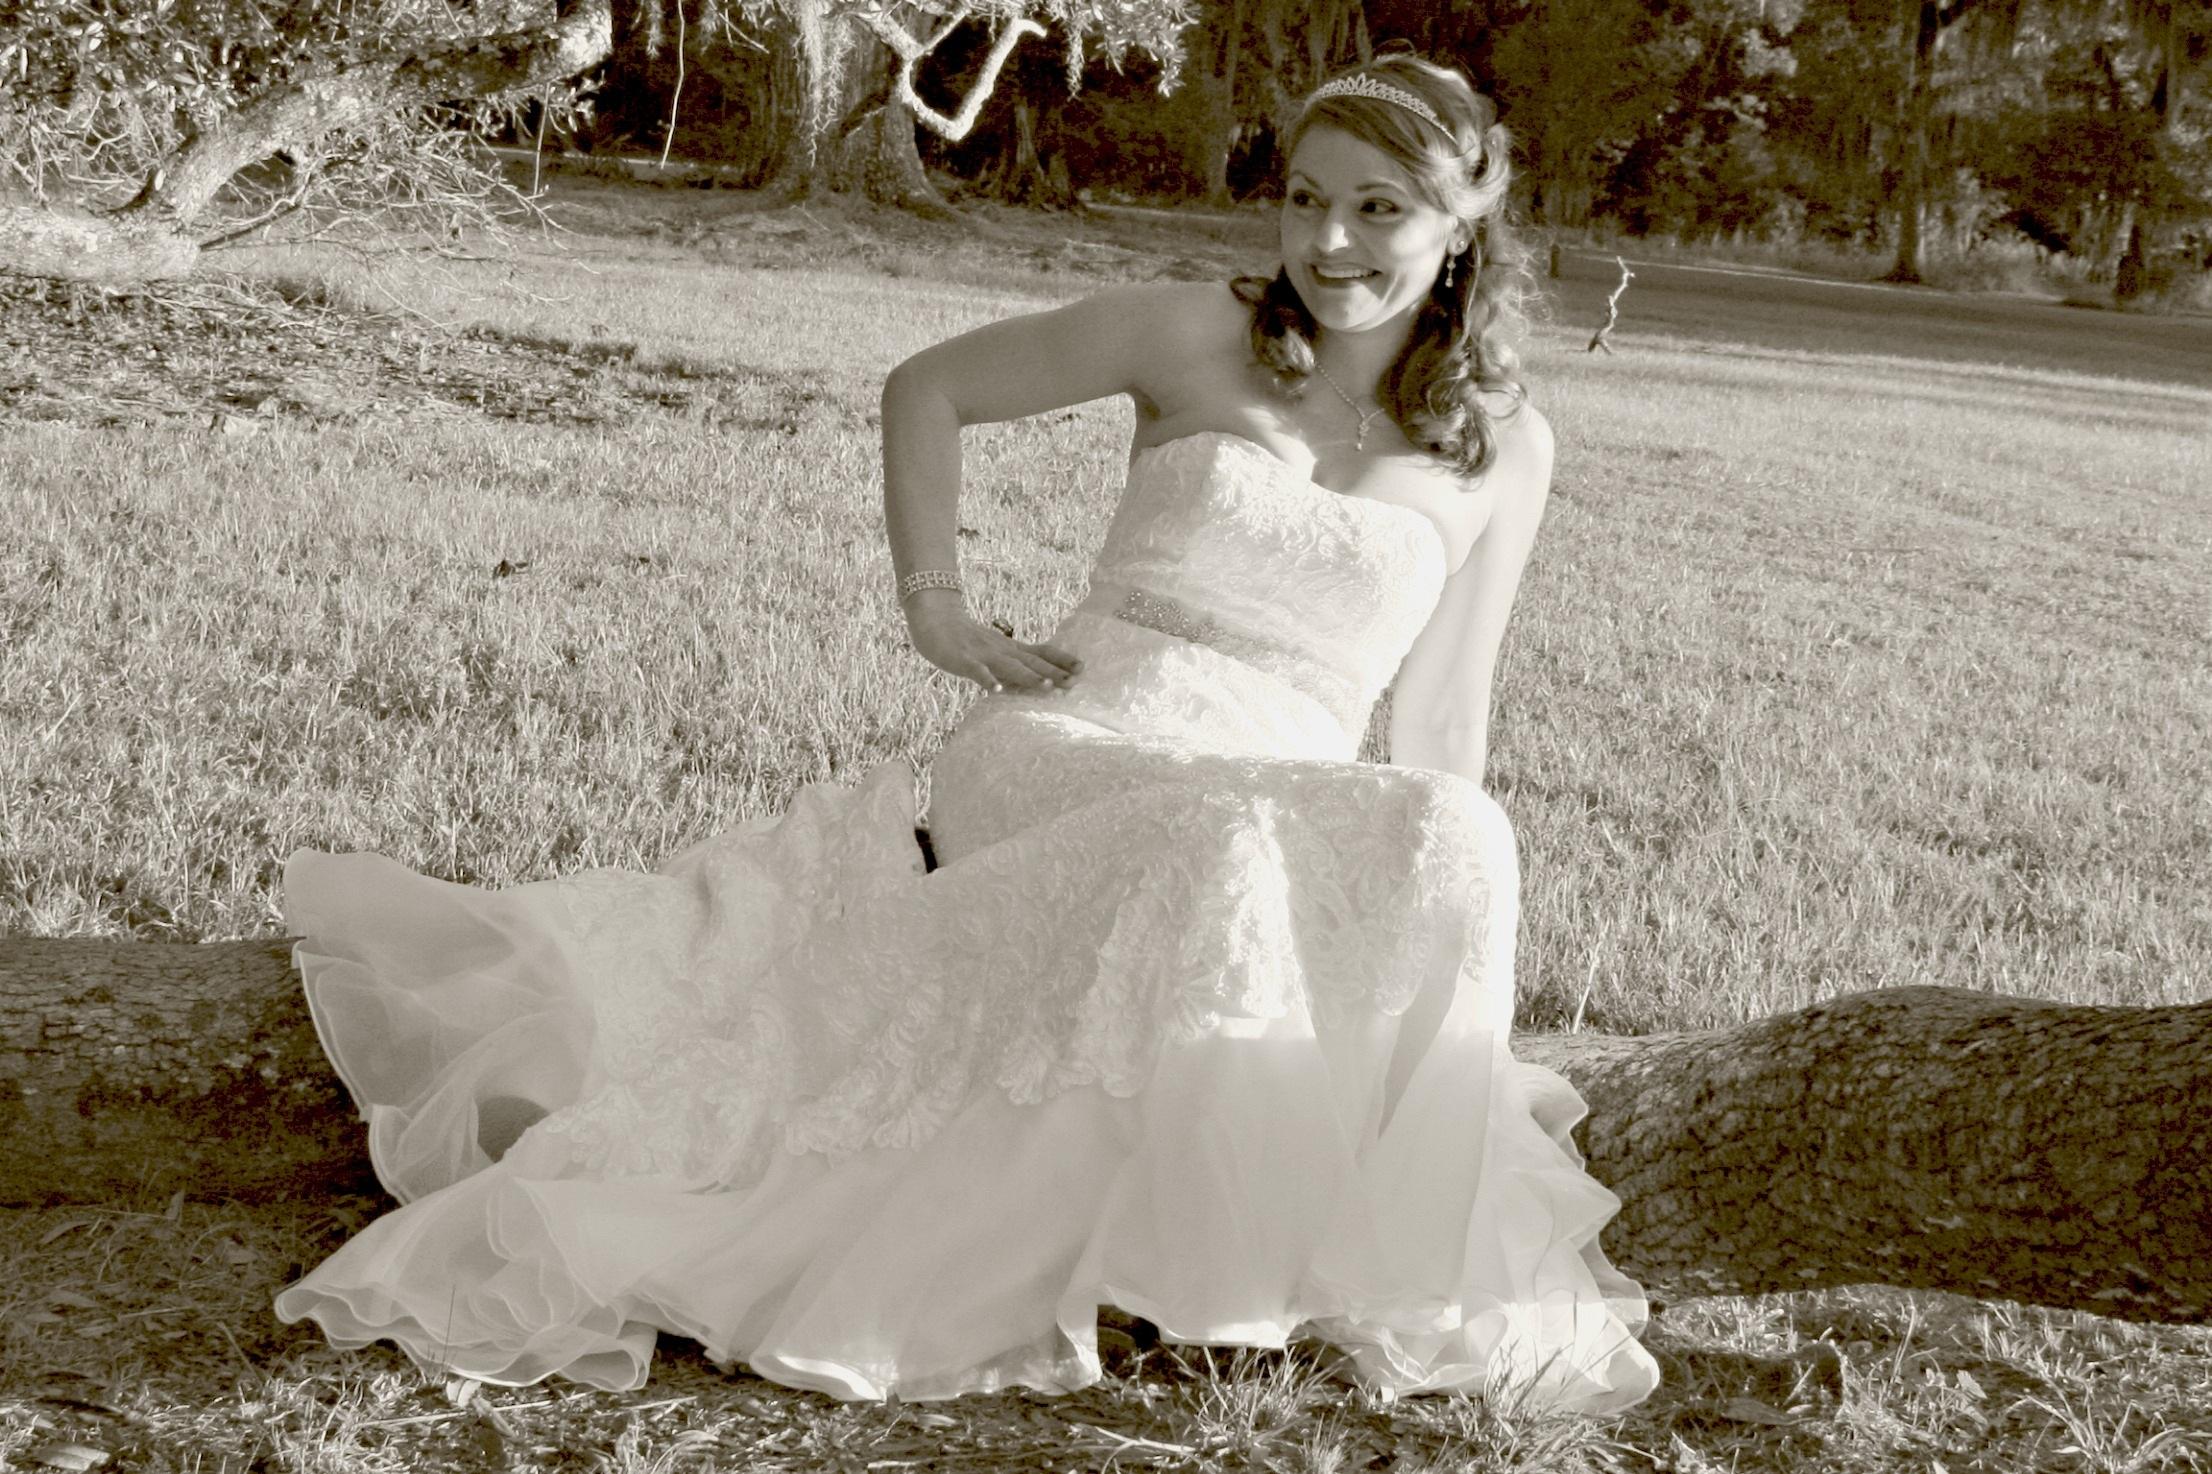 f272ef07baf2 kvinde hvid romantik mode tøj bryllup bryllupskjole brud Brudgom ceremoni  kjole fotografi tiara kjole elegance brude